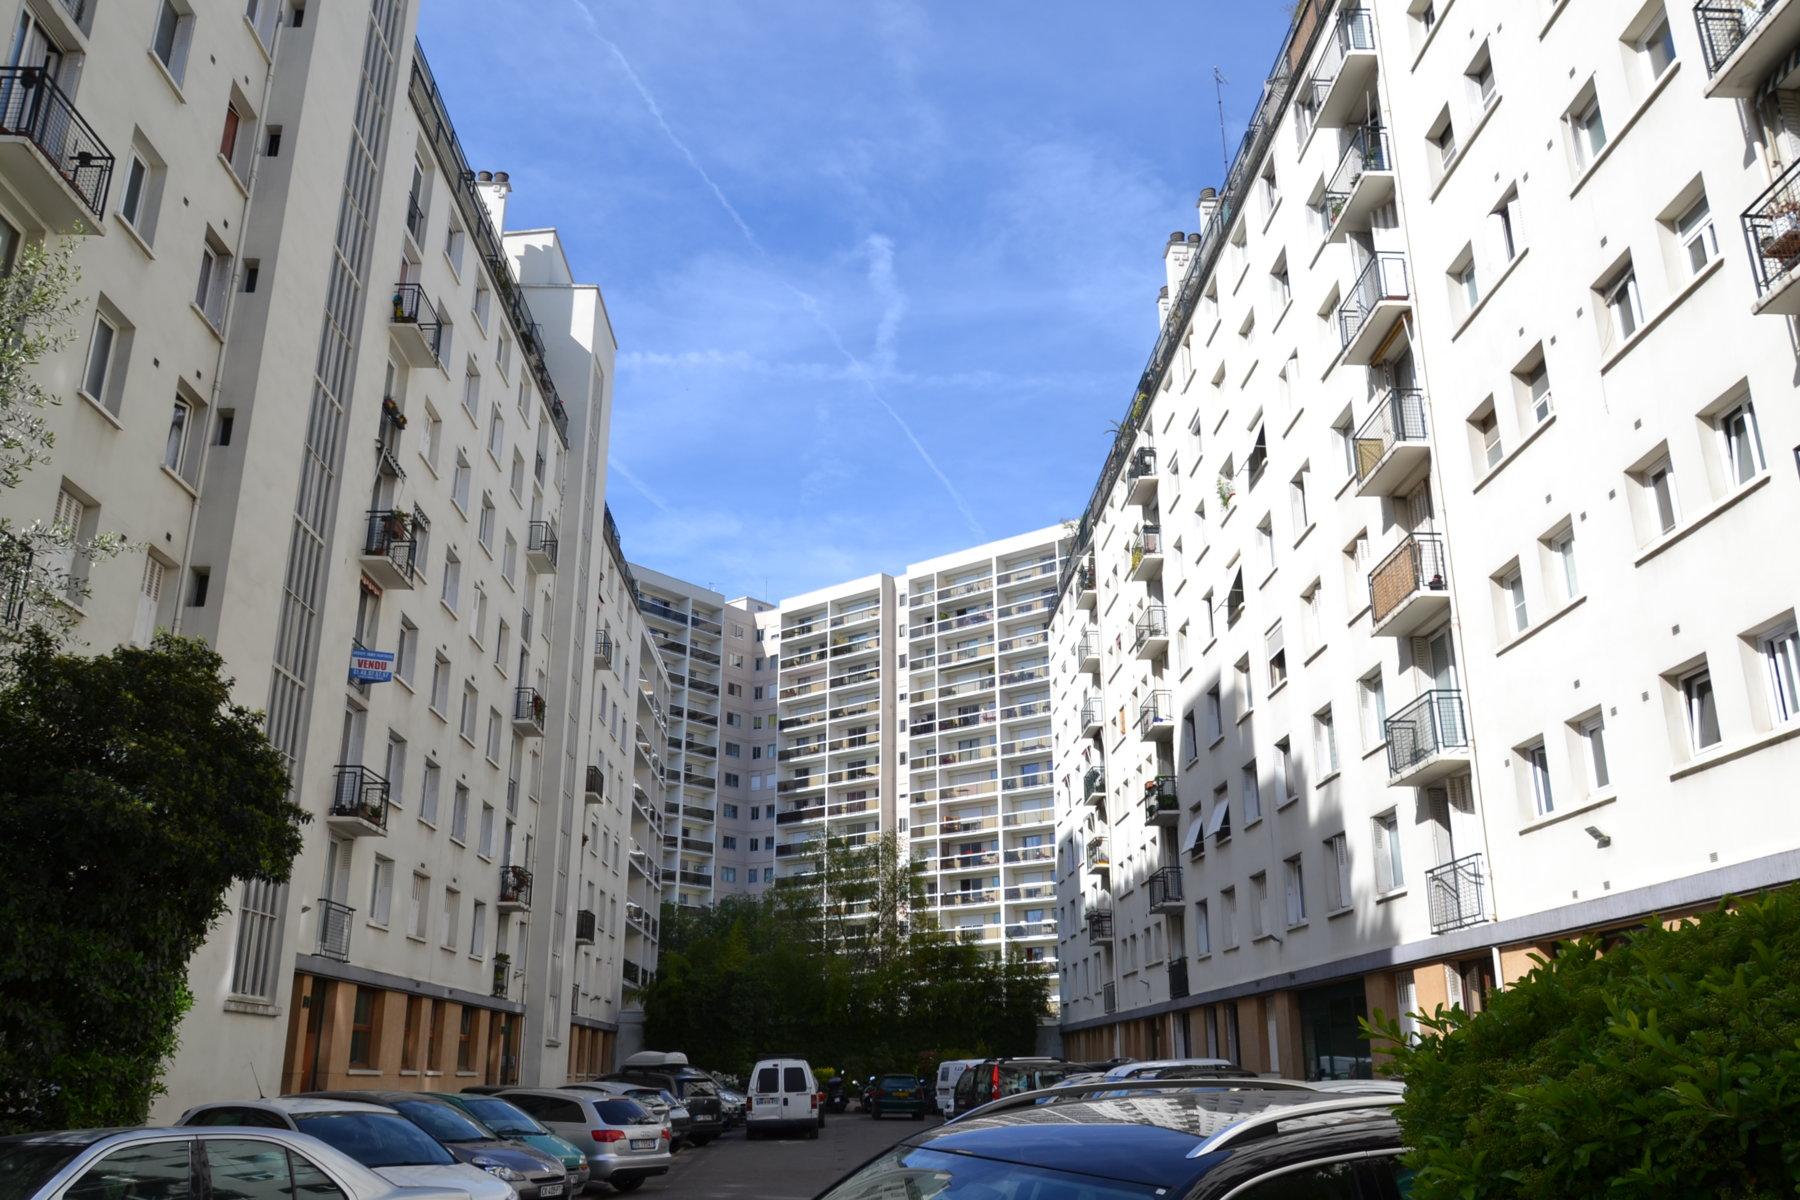 Ahurissant 139 avenue daumesnil 75012 paris renaa conception - Leroy merlin nation ...